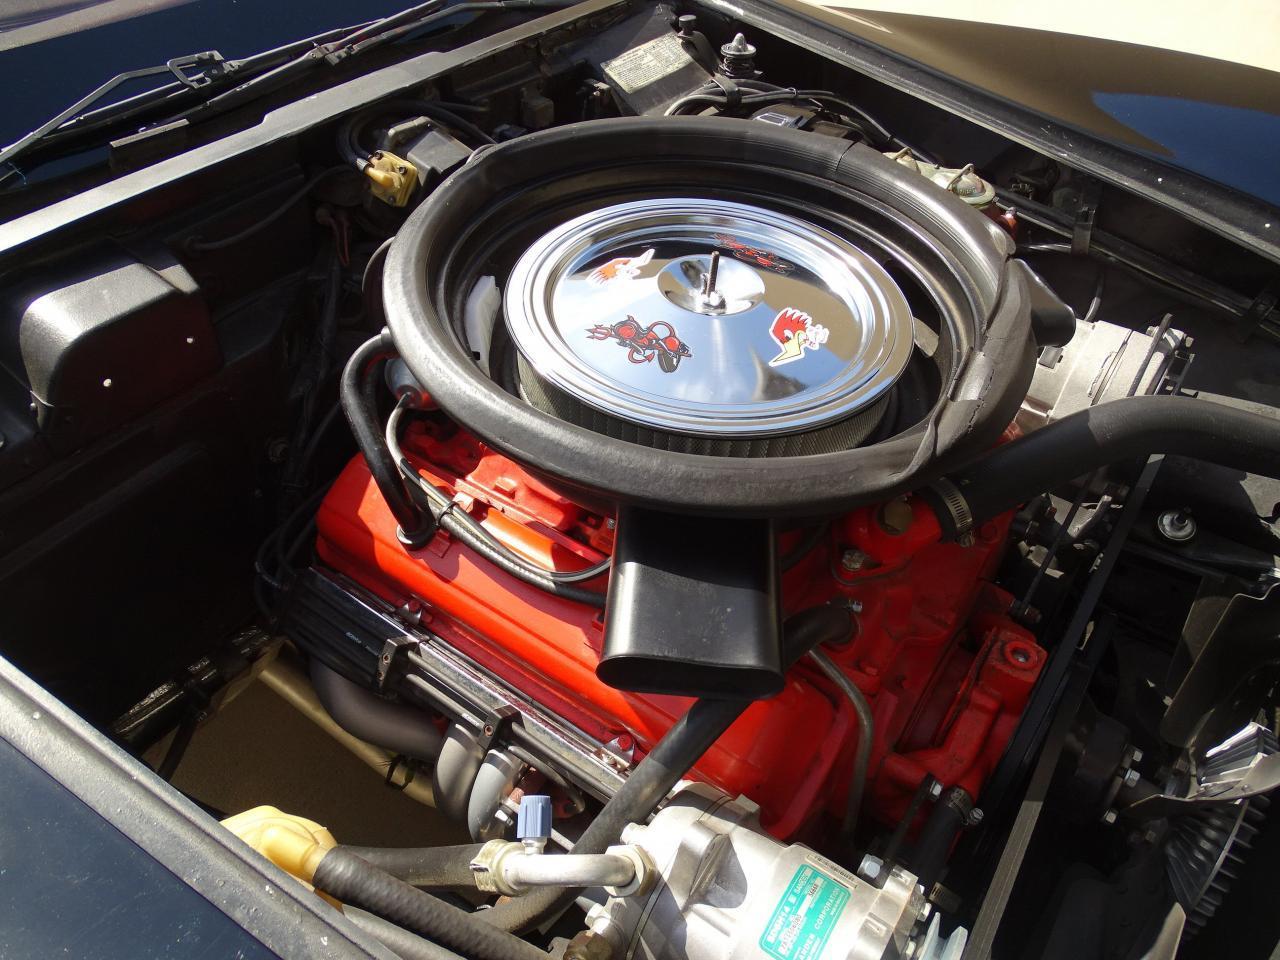 Large Picture of '74 Corvette located in Texas - $29,995.00 - LAOQ